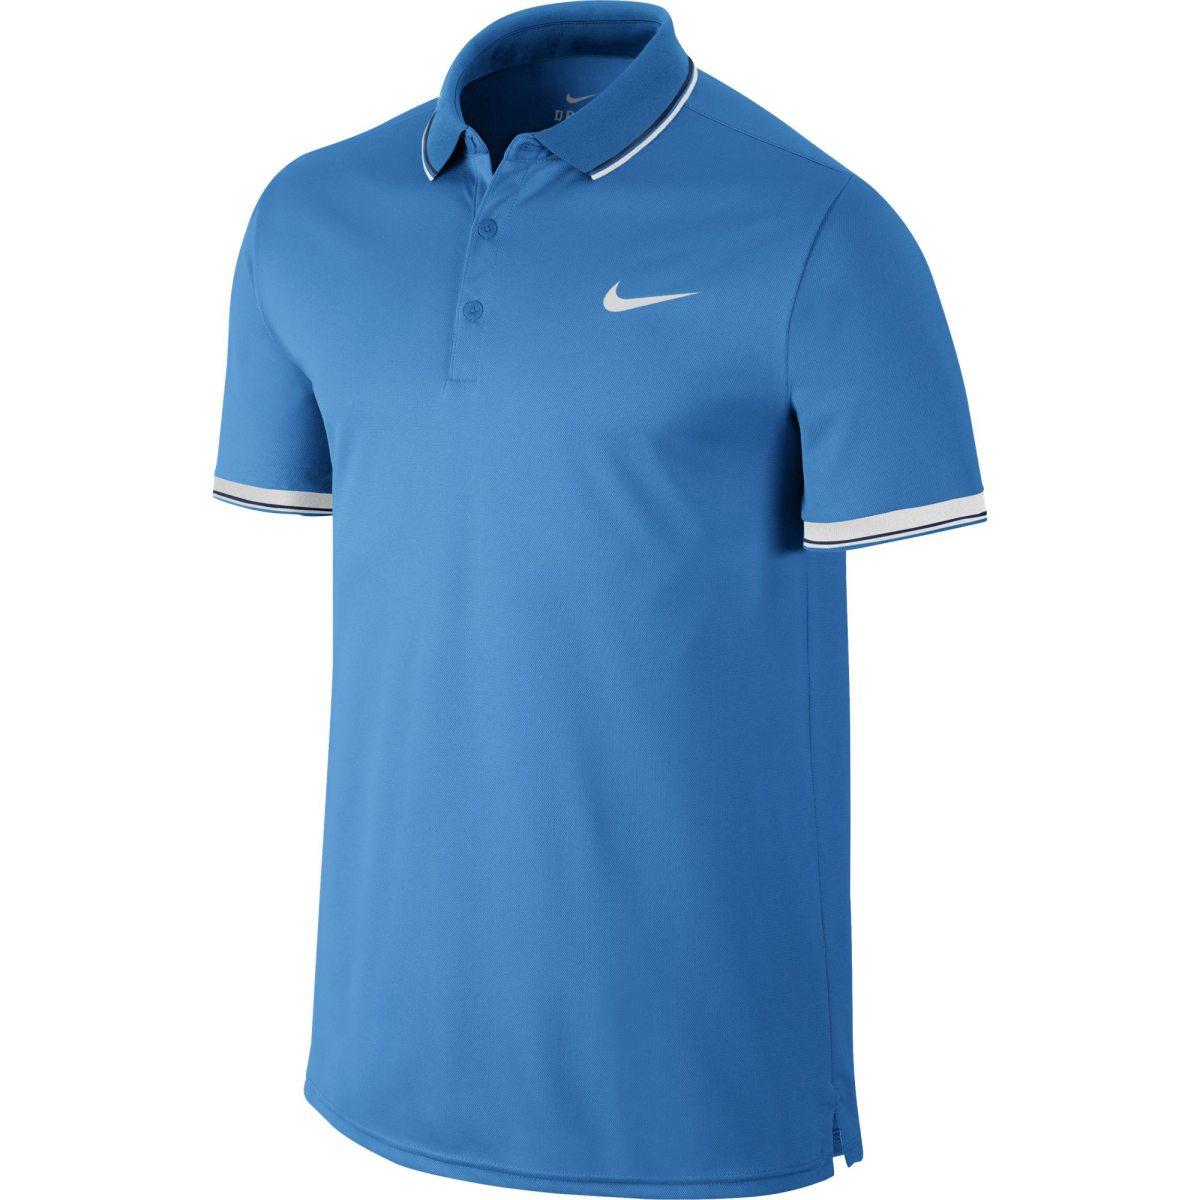 100% authentic cfbcc 19514 blå nike court polo tenniströja herr pikéer